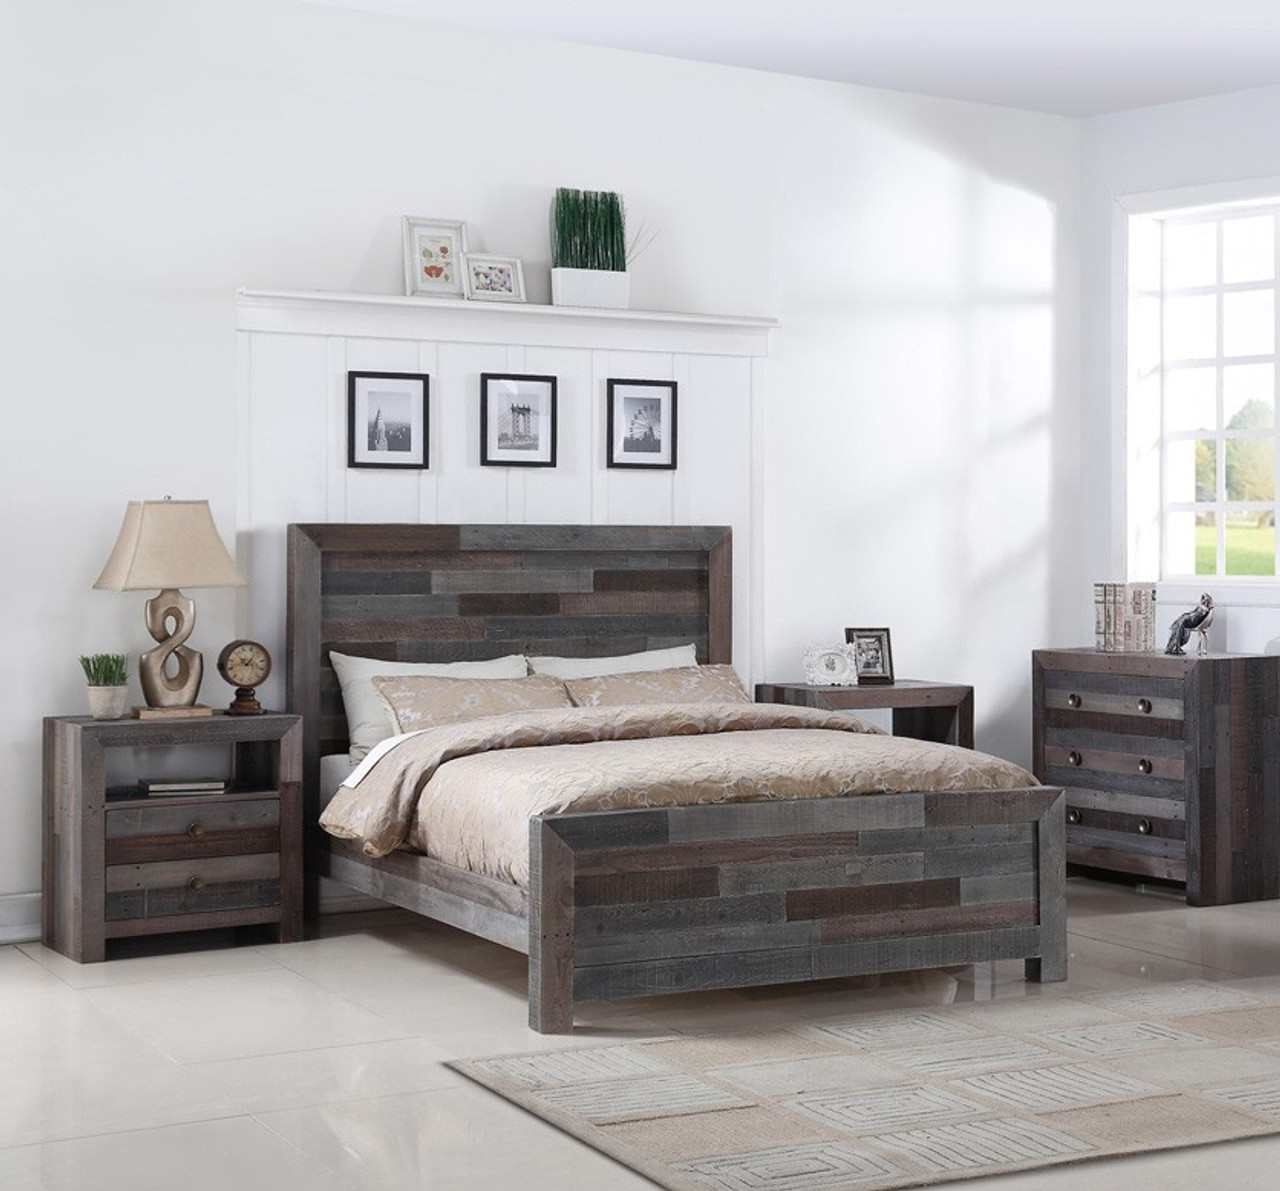 Angora Reclaimed Wood King Size Platform Bed Storm Zin Home